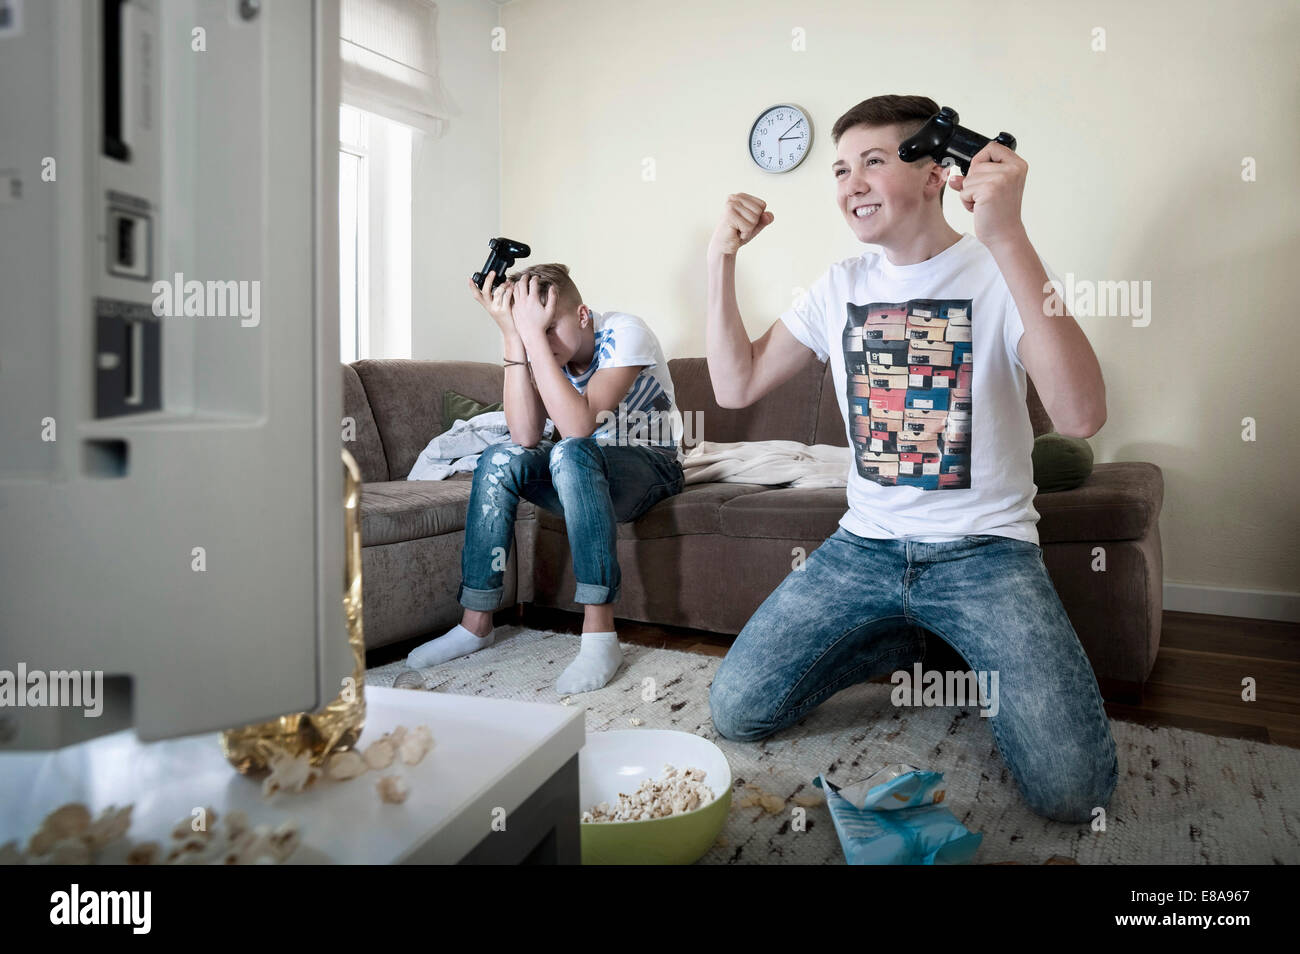 Two teenage boys playing video game - Stock Image